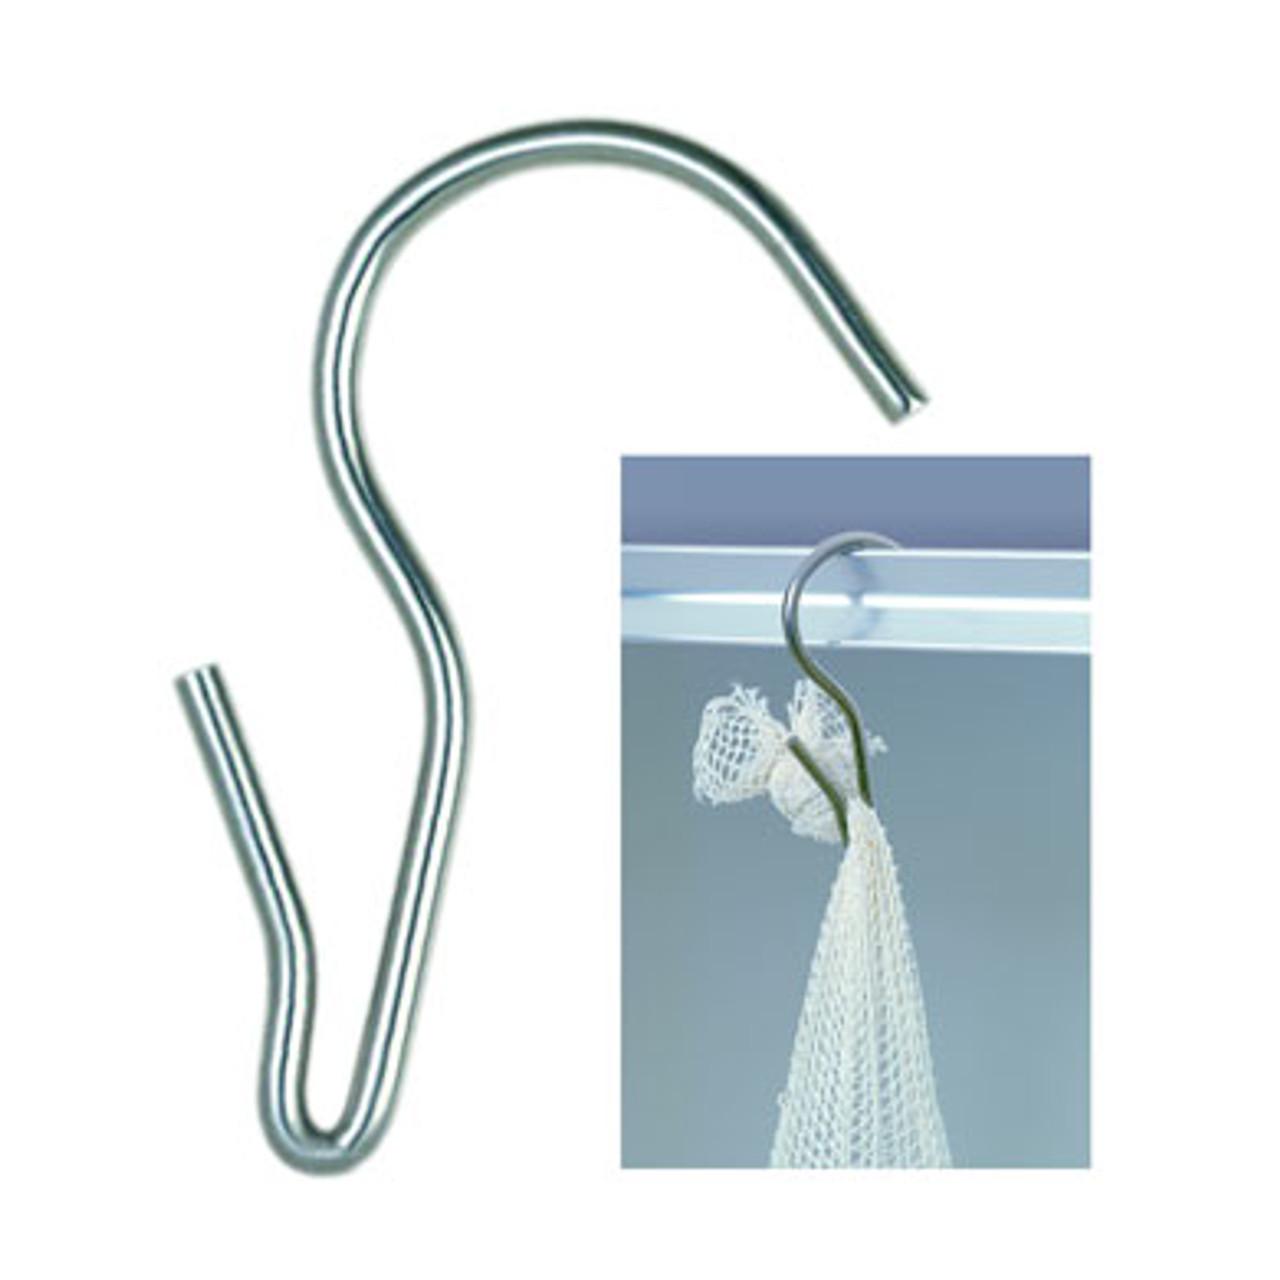 "Stainless Steel Stockinette Hook (1/4"" x 4 1/4"" for 1 1/2"" Sticks)"